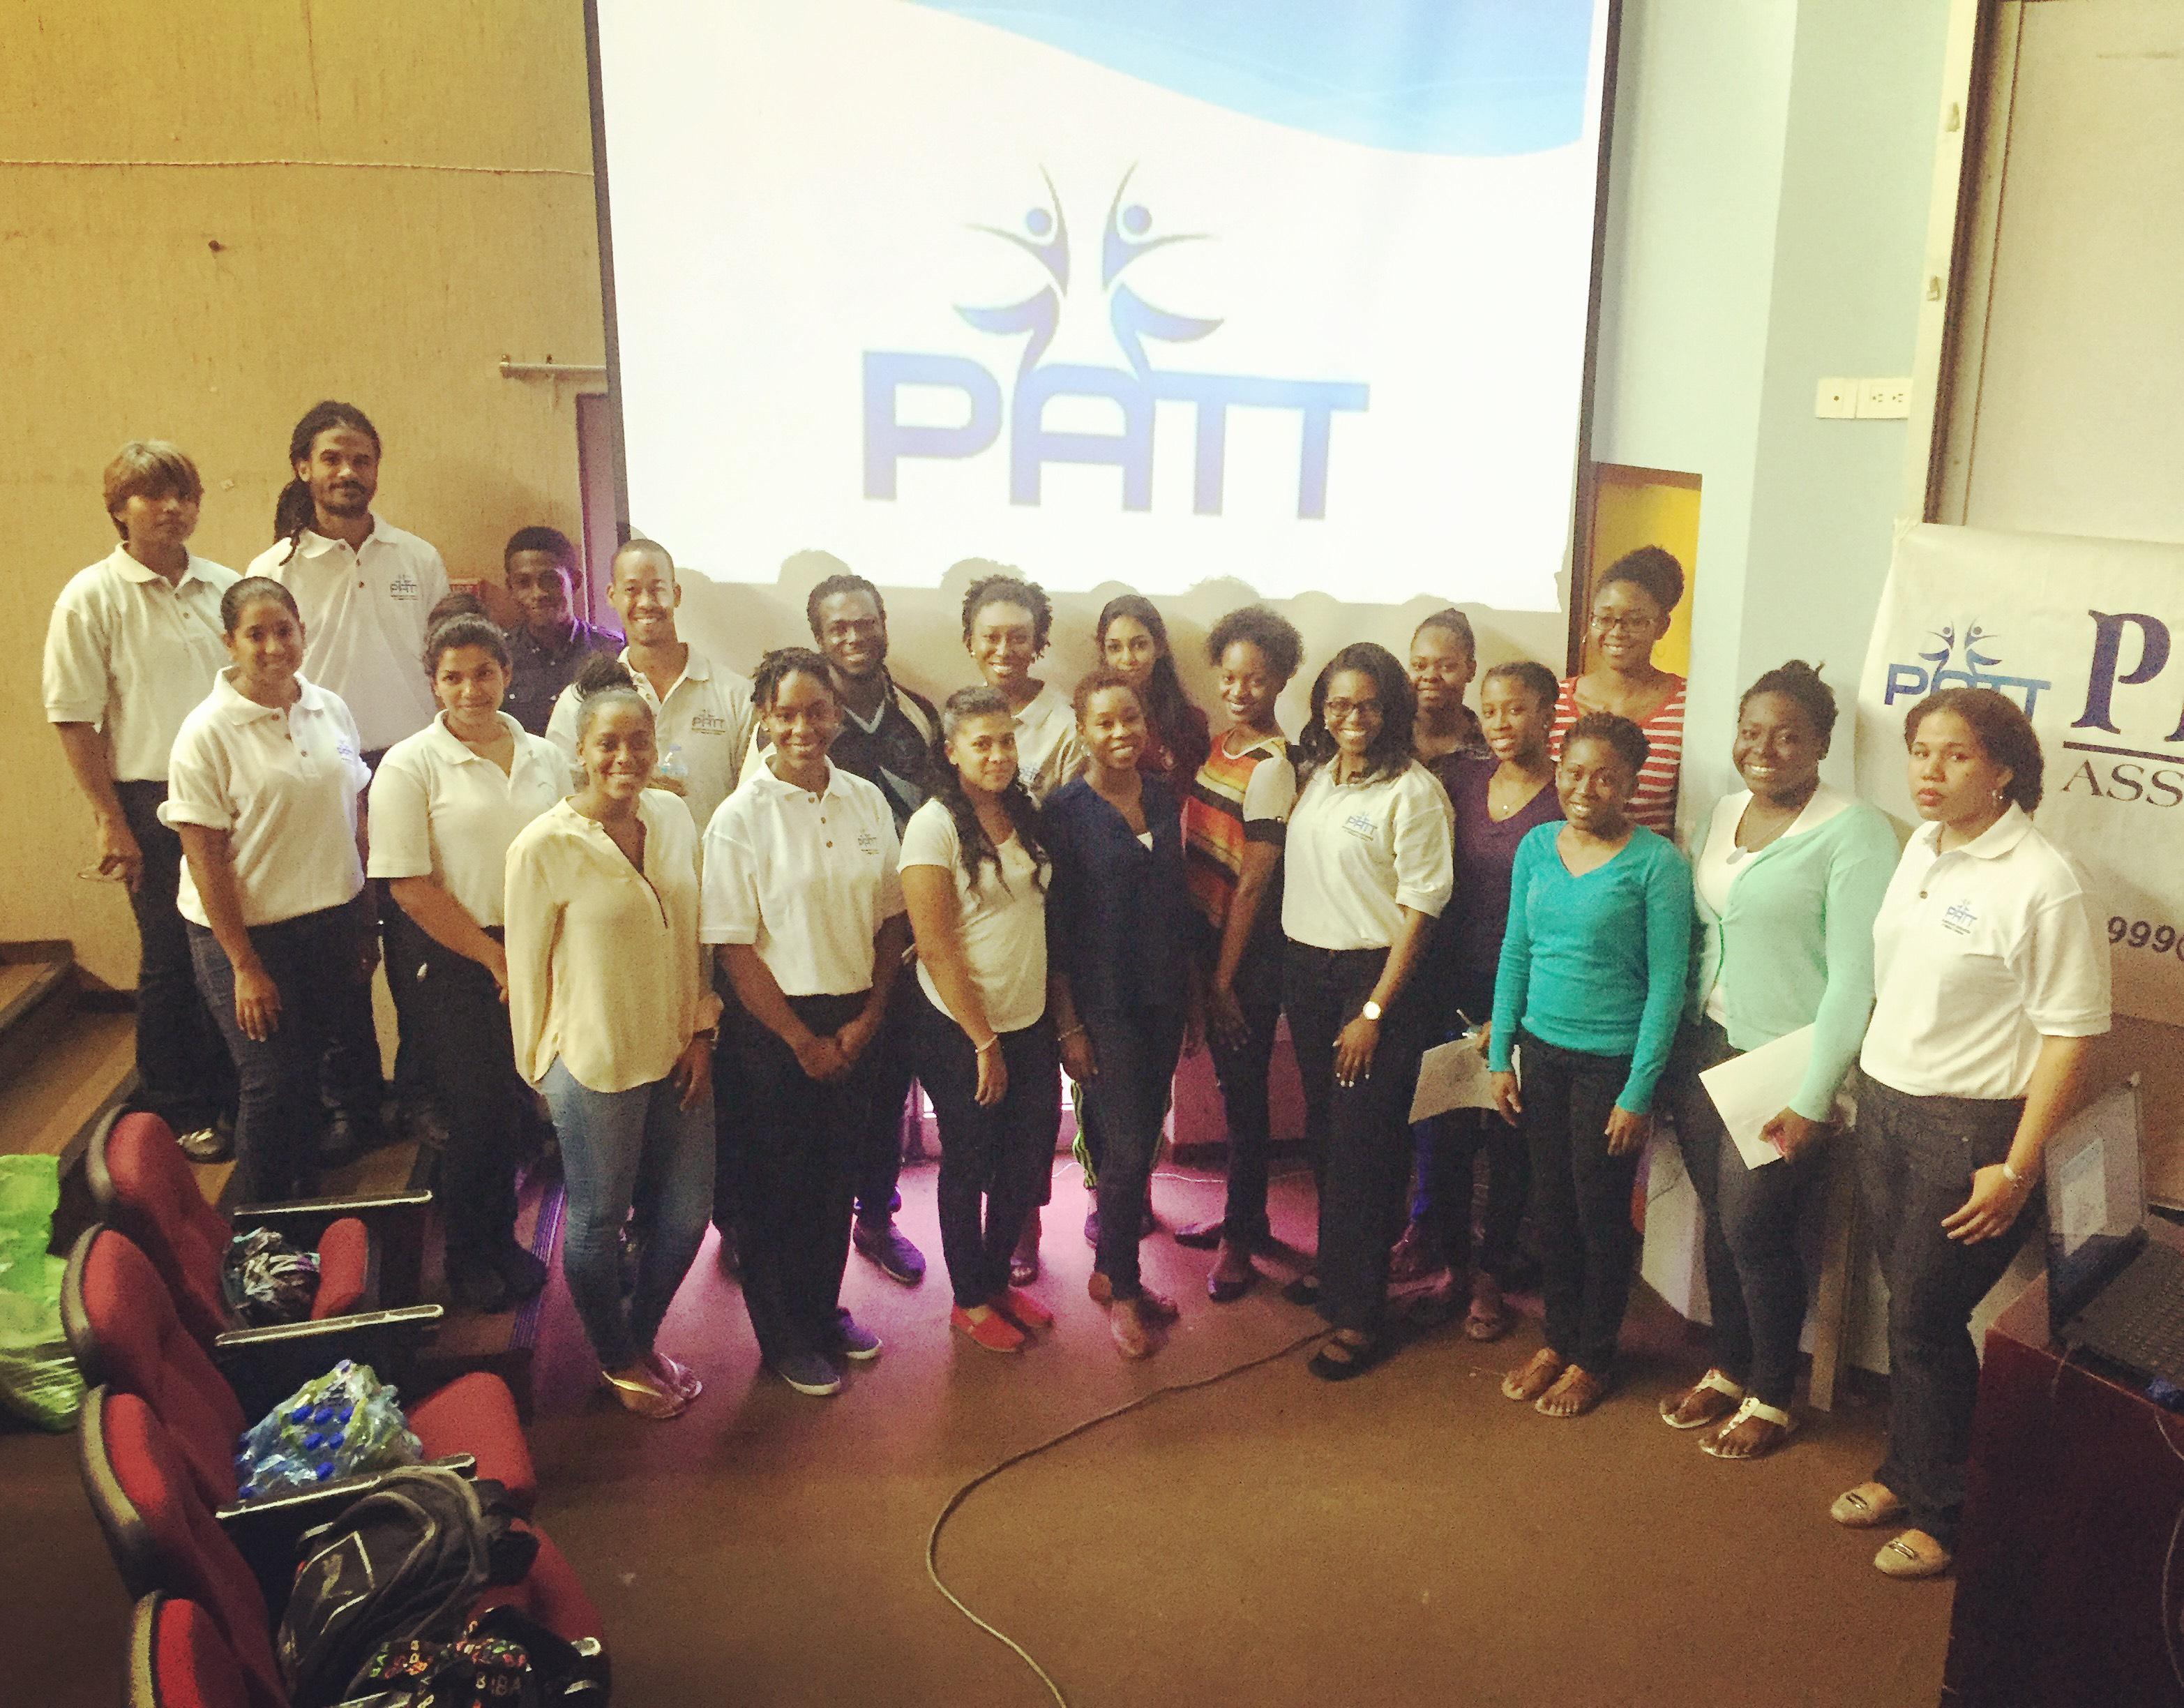 PATT Exec and Forum Attendees